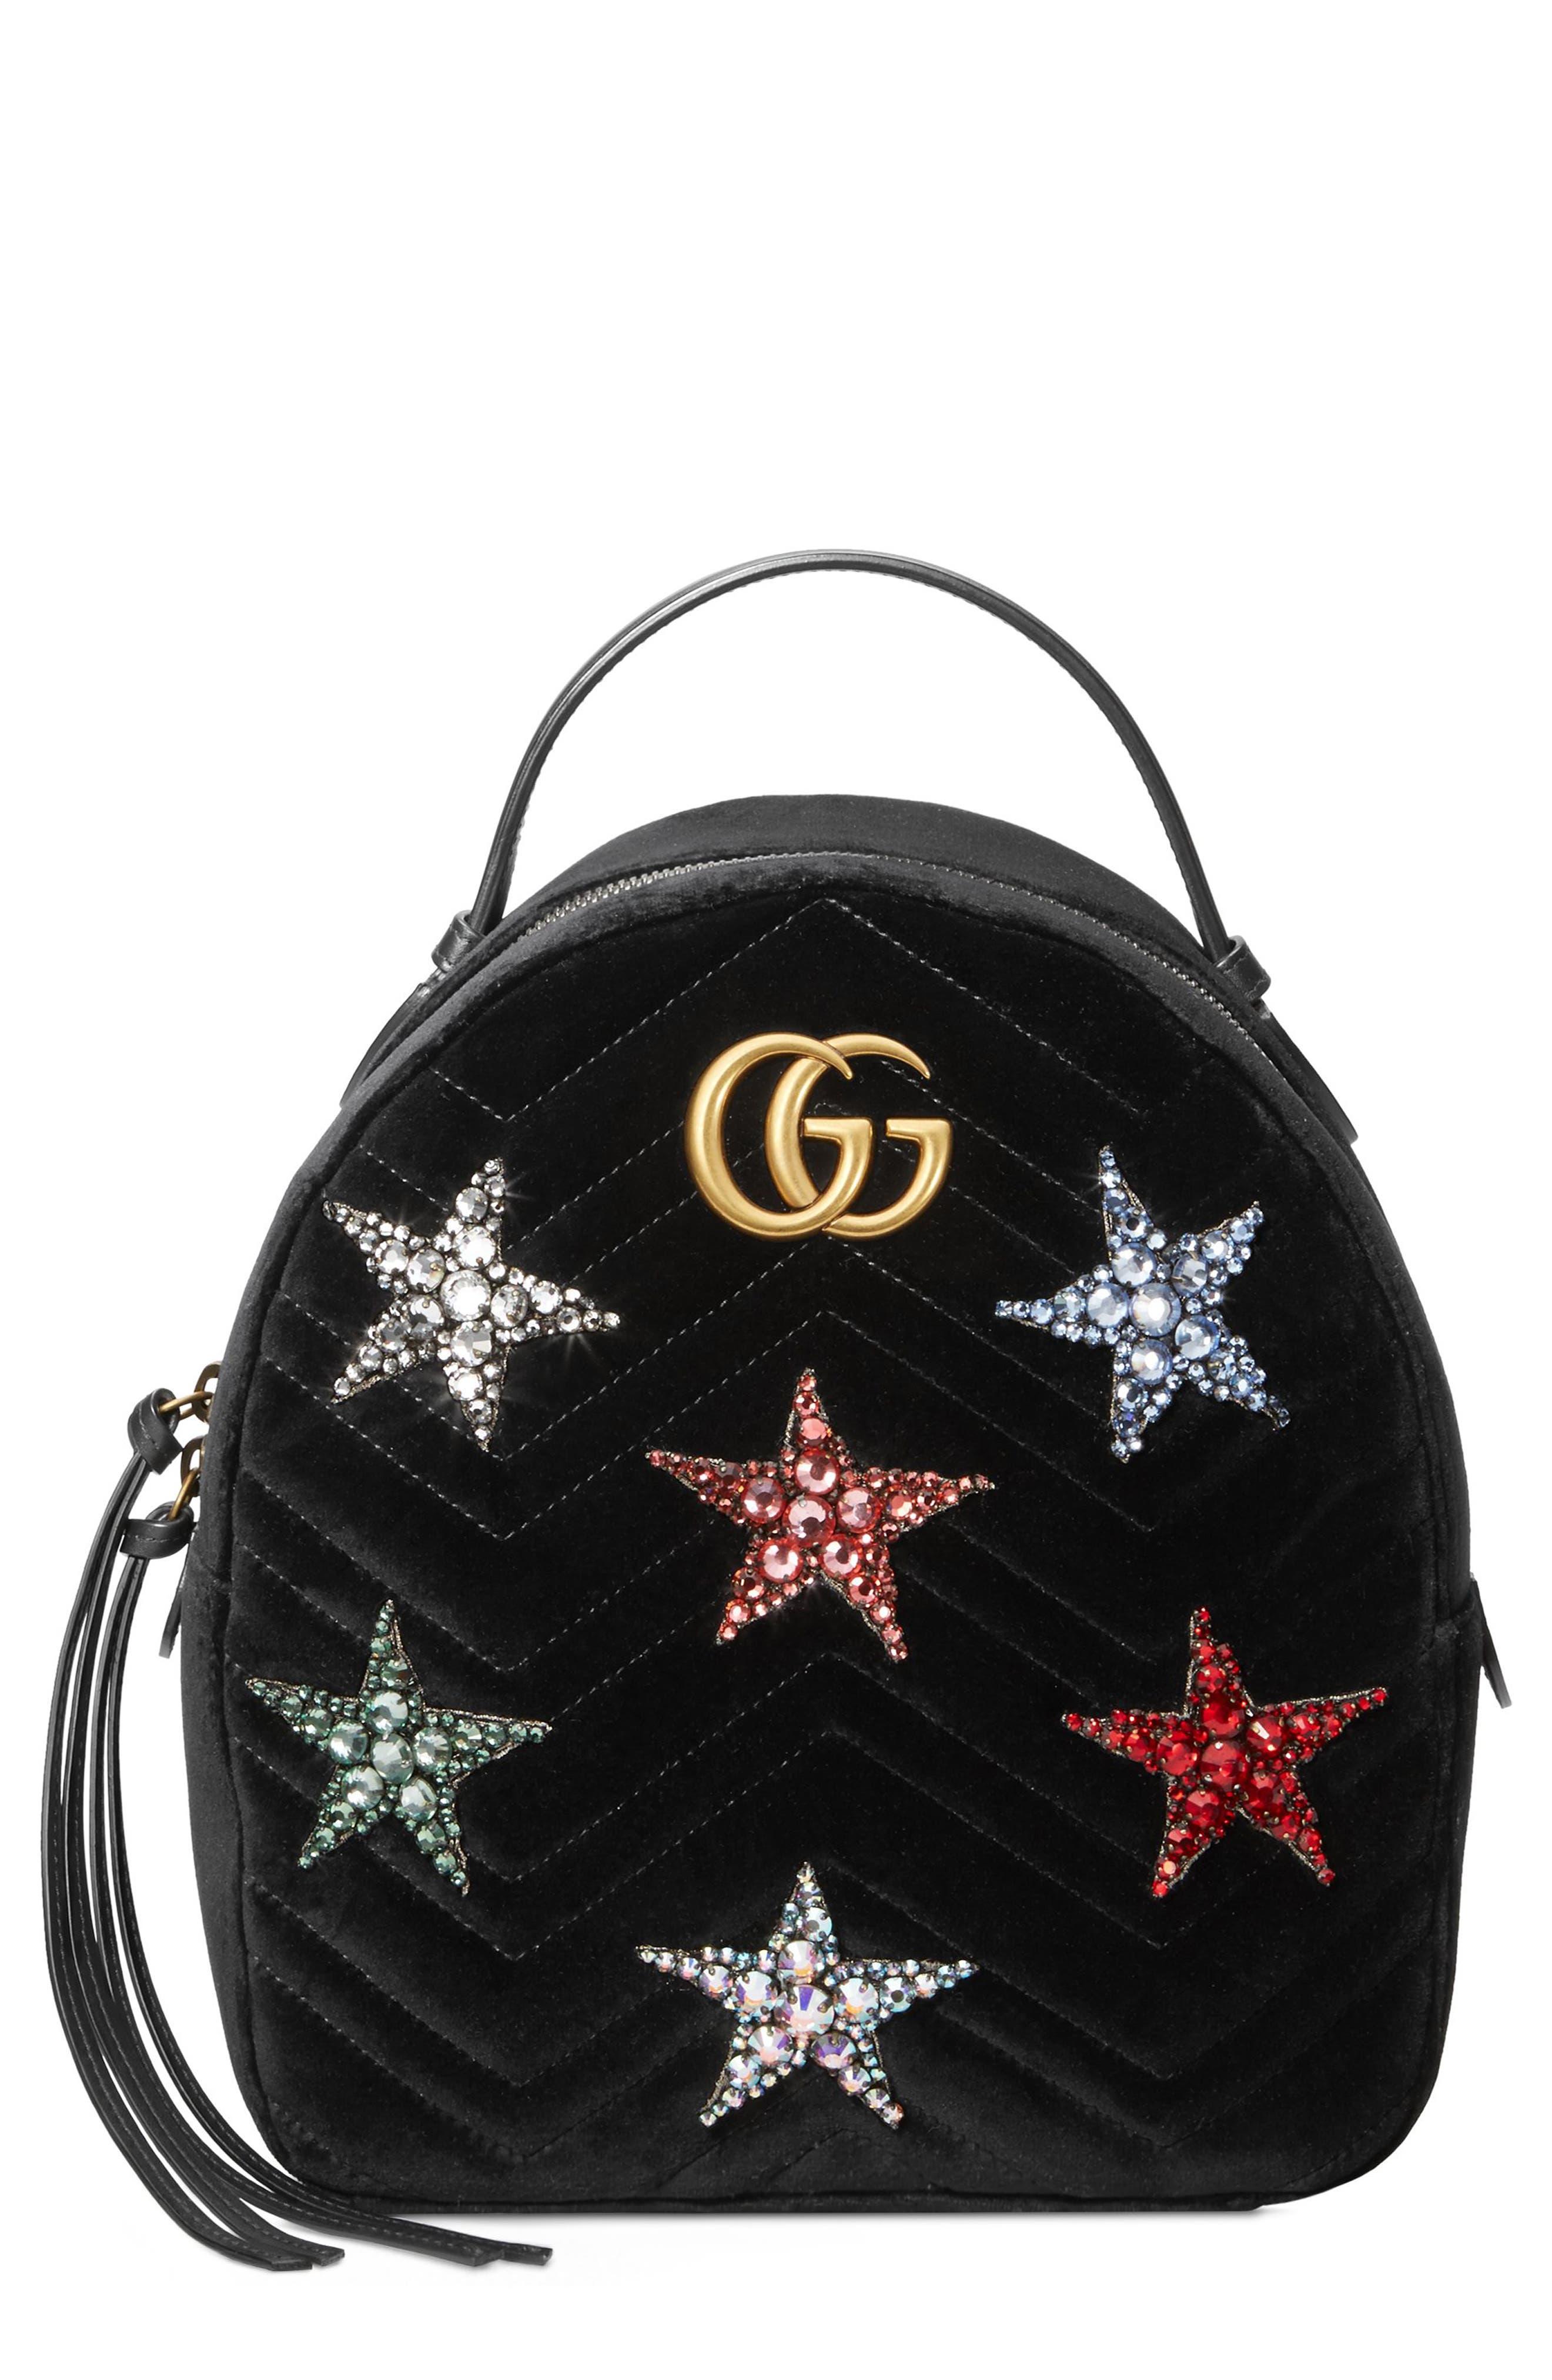 Marmont 2.0 Crystal Stars Velvet Backpack,                             Main thumbnail 1, color,                             NERO/ NERO MULTI